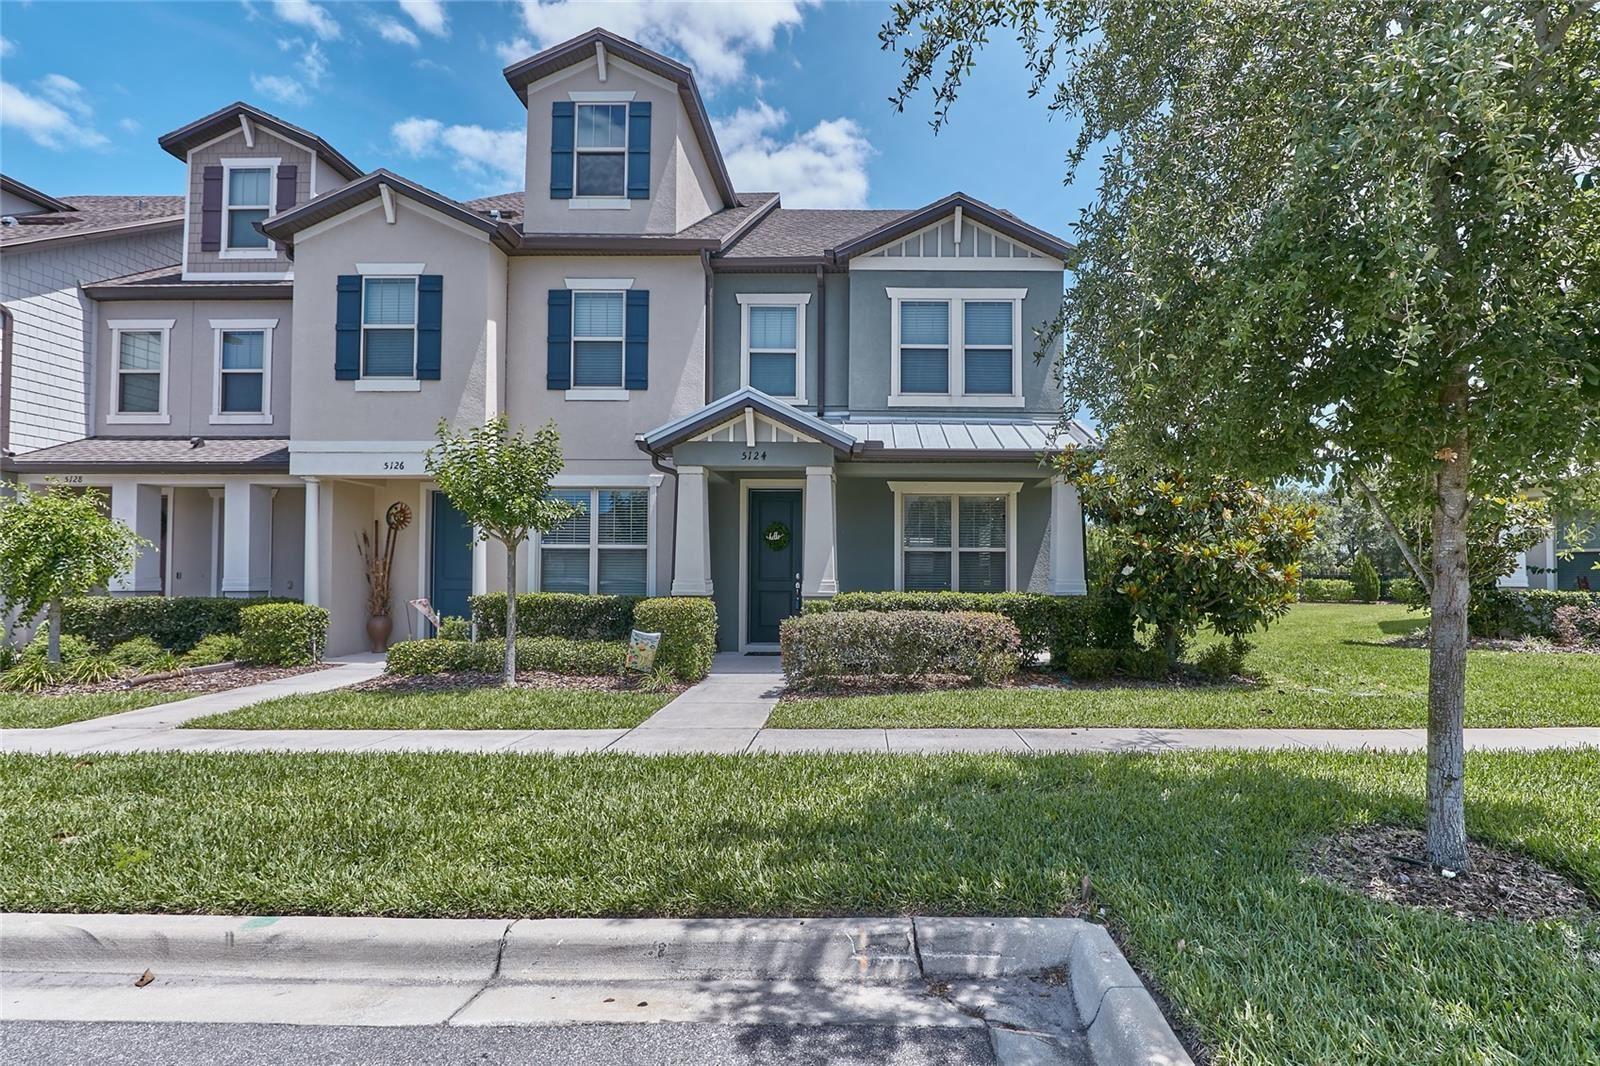 5124 CASPIAN STREET, Saint Cloud, FL 34771 - #: O5951965